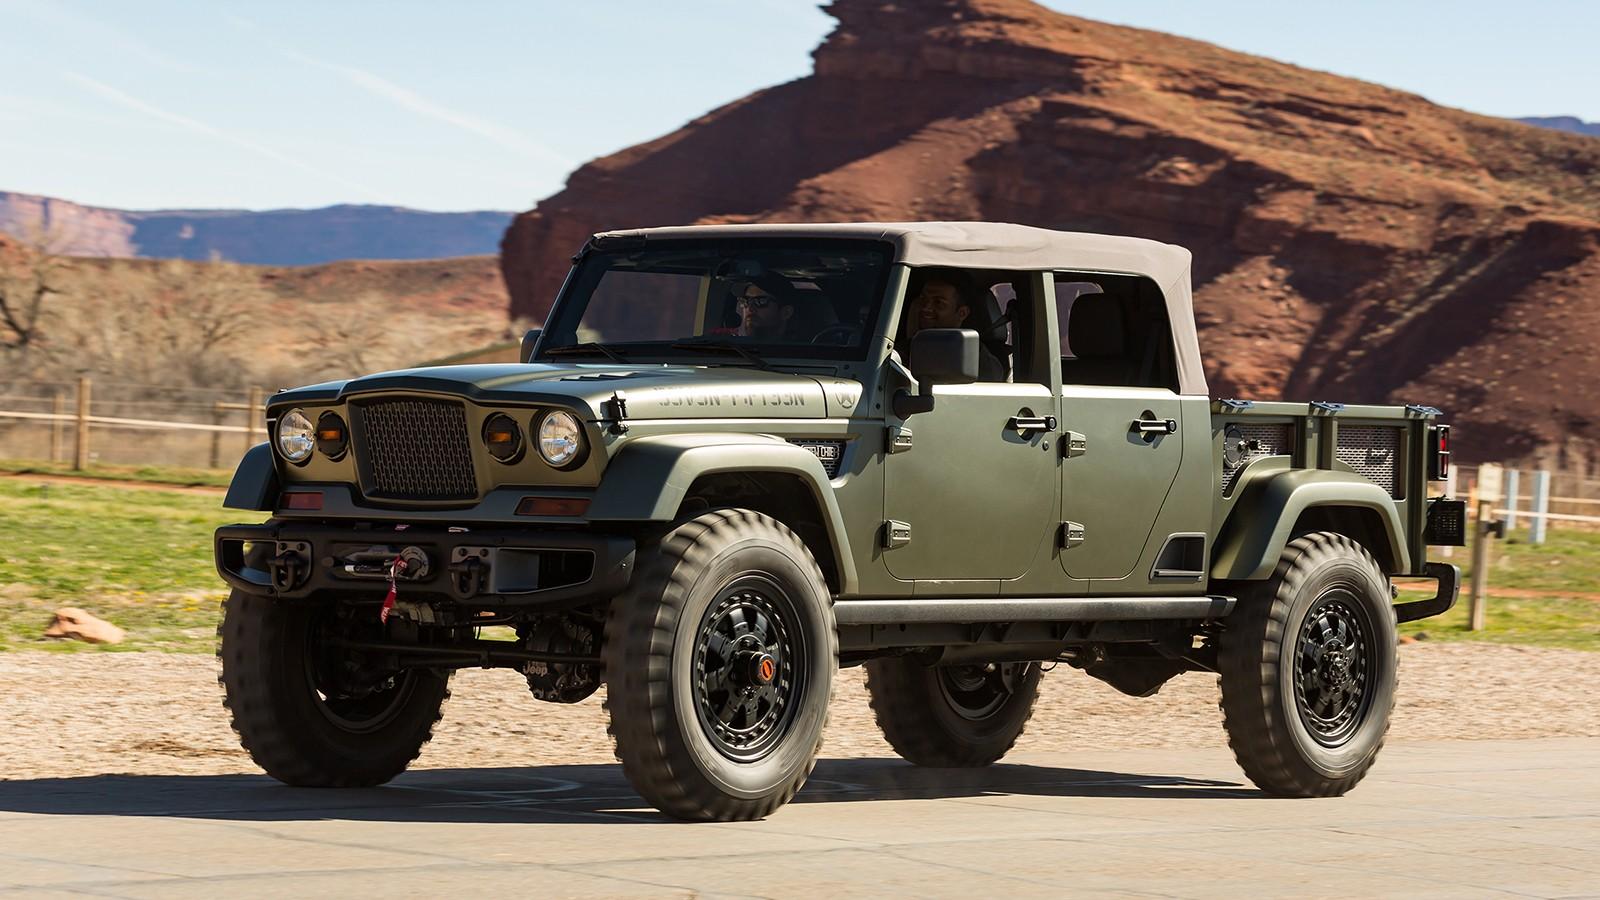 На фото: Jeep Crew Chief 715 Concept